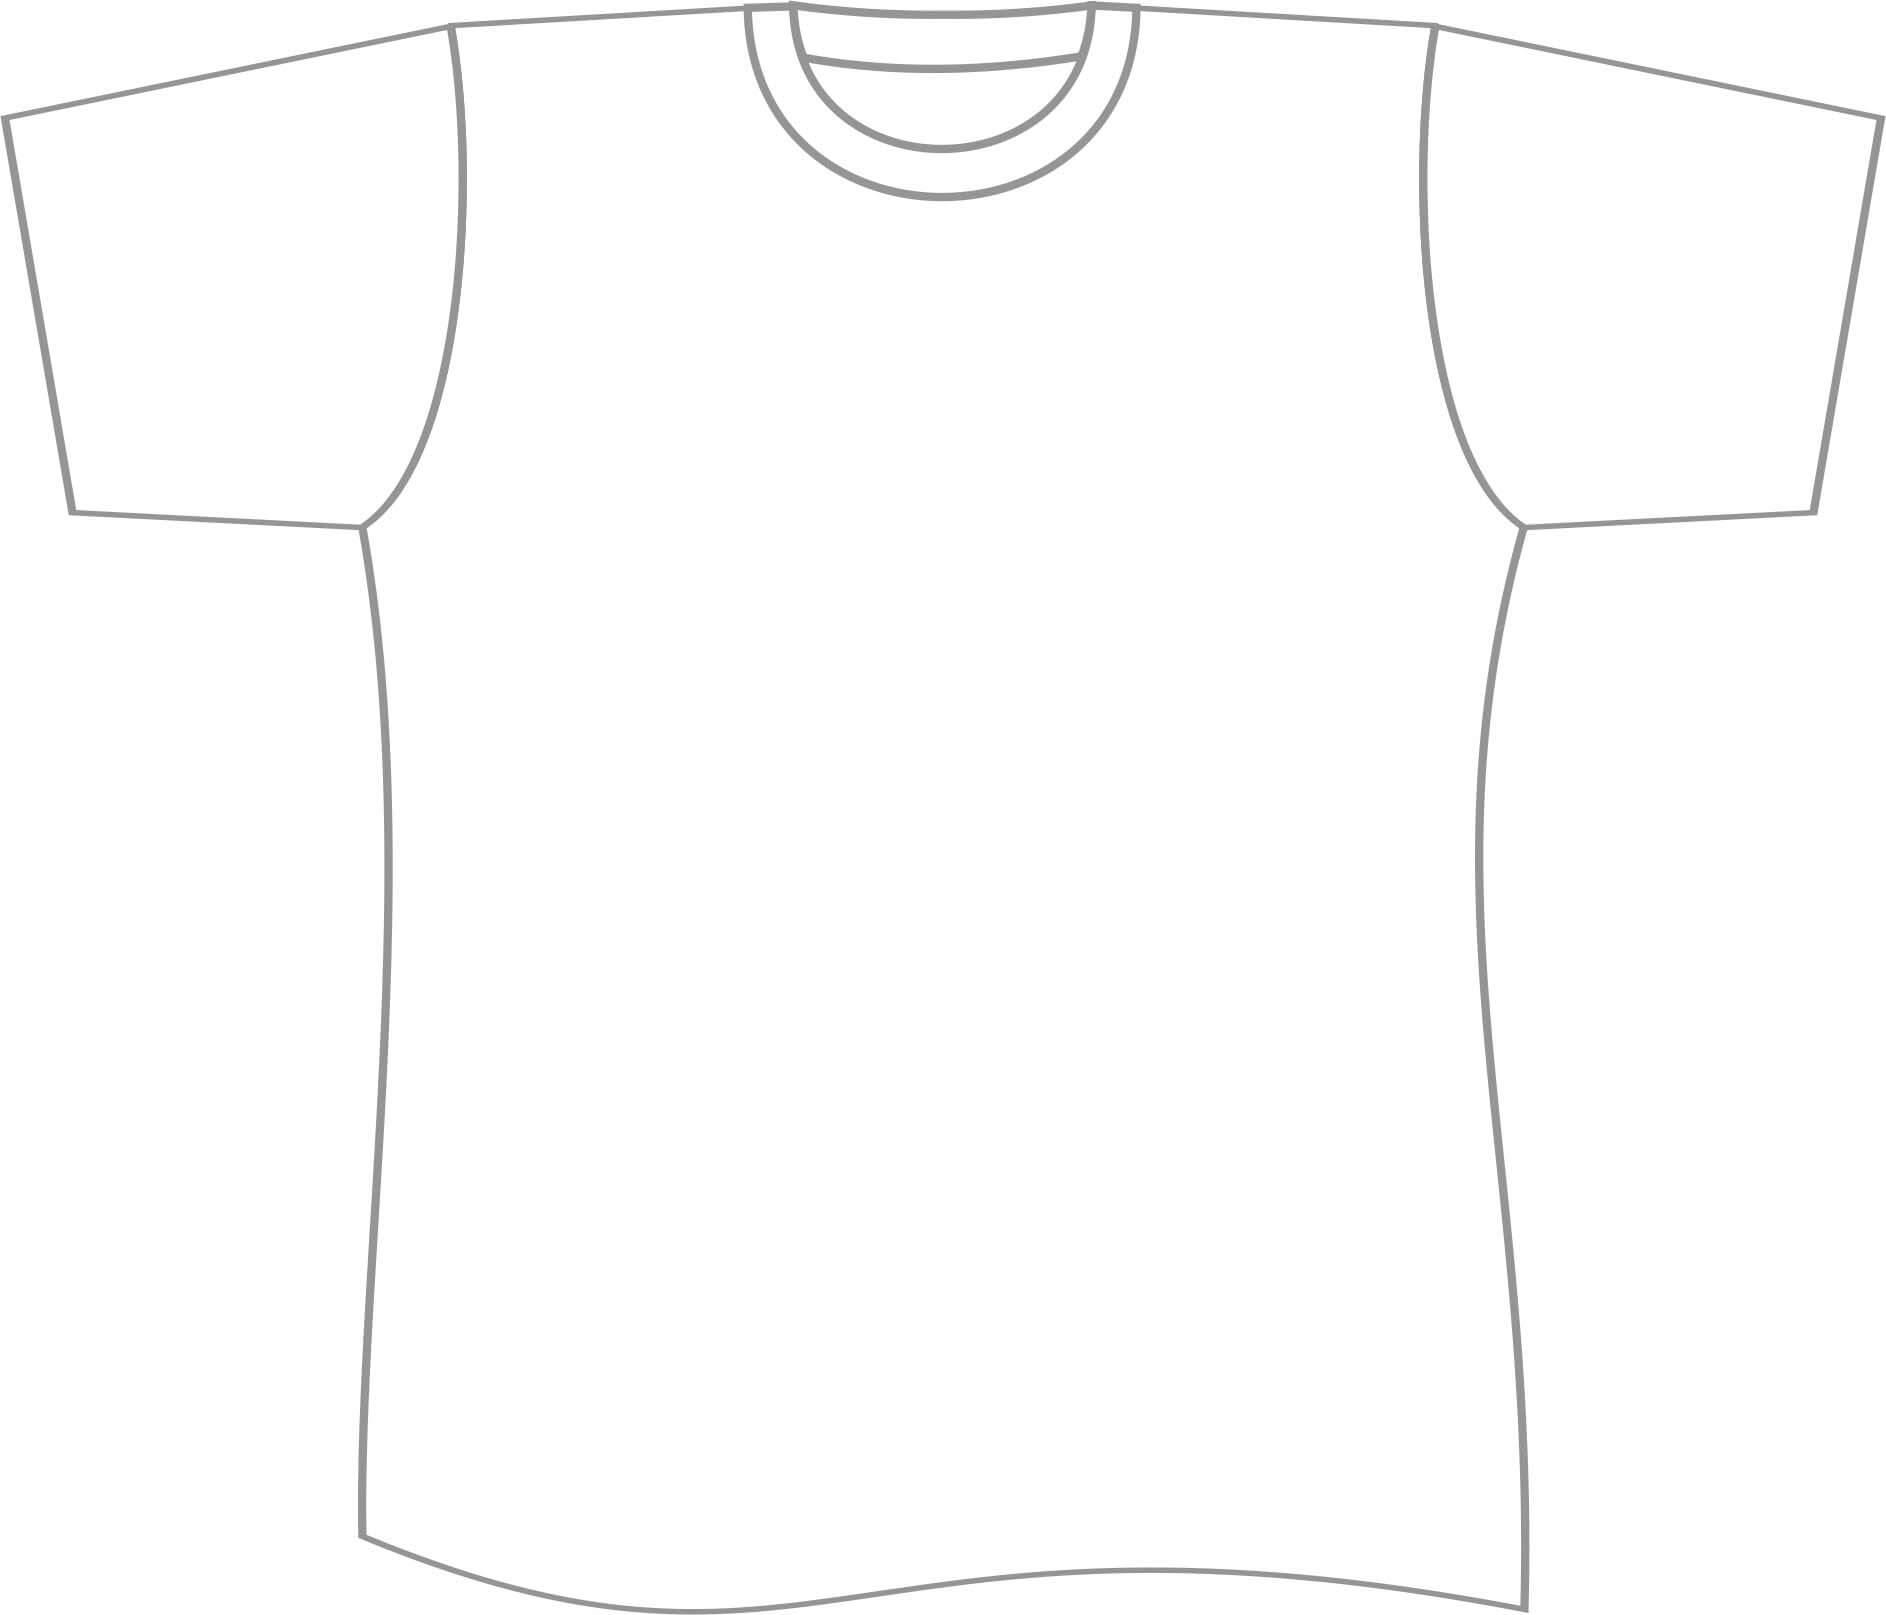 Free T Shirt Template Printable, Download Free Clip Art Regarding Printable Blank Tshirt Template